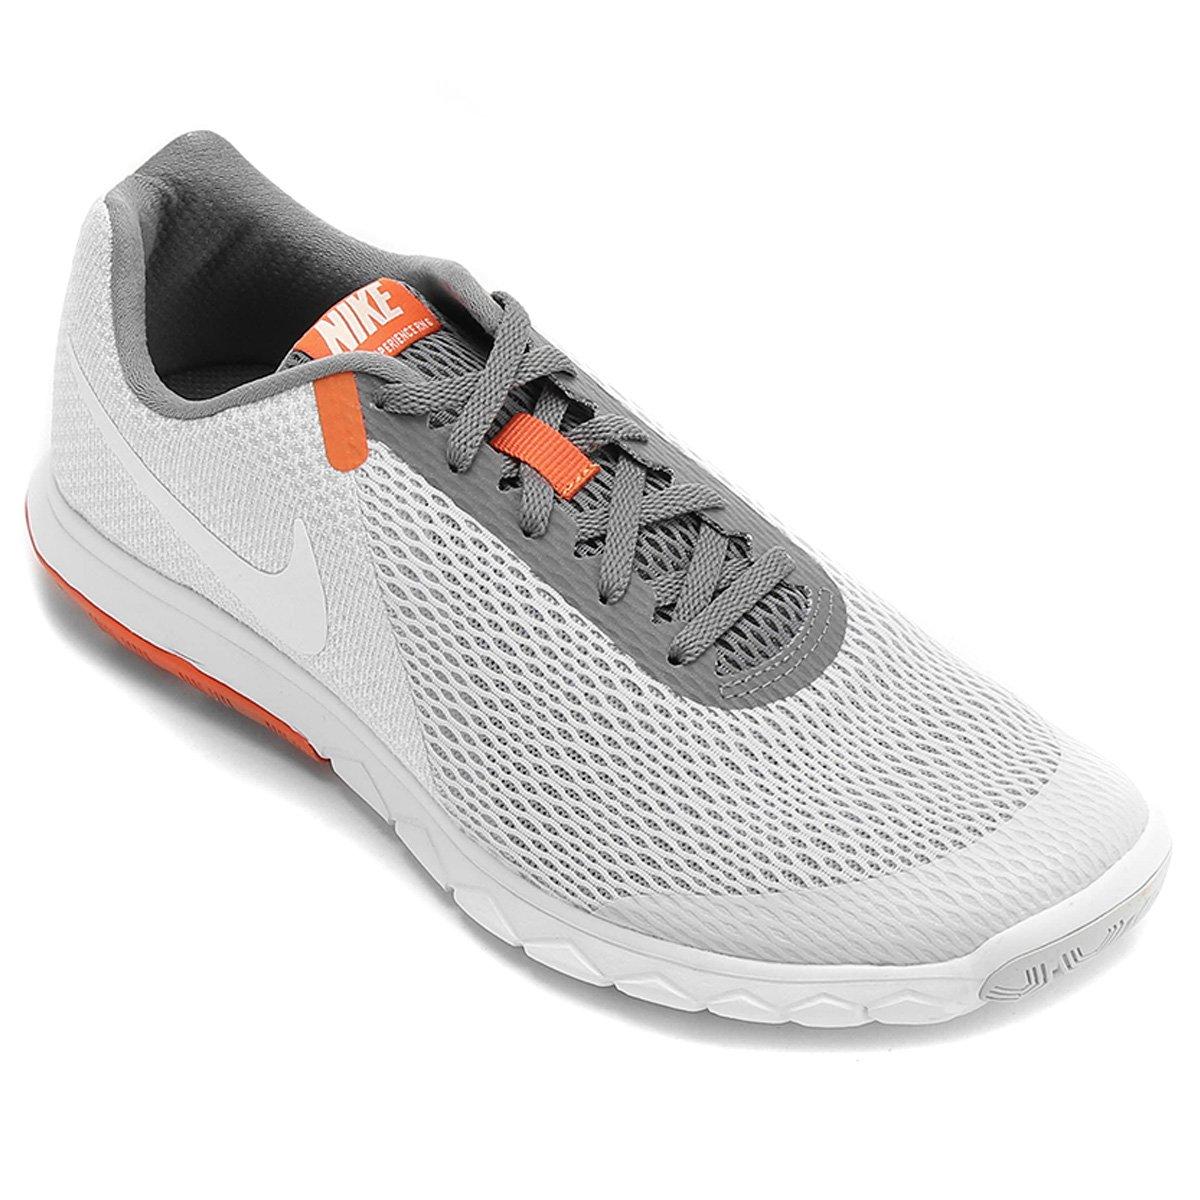 5807c04035d Tênis Nike Flex Experience Rn 6 Masculino - Compre Agora